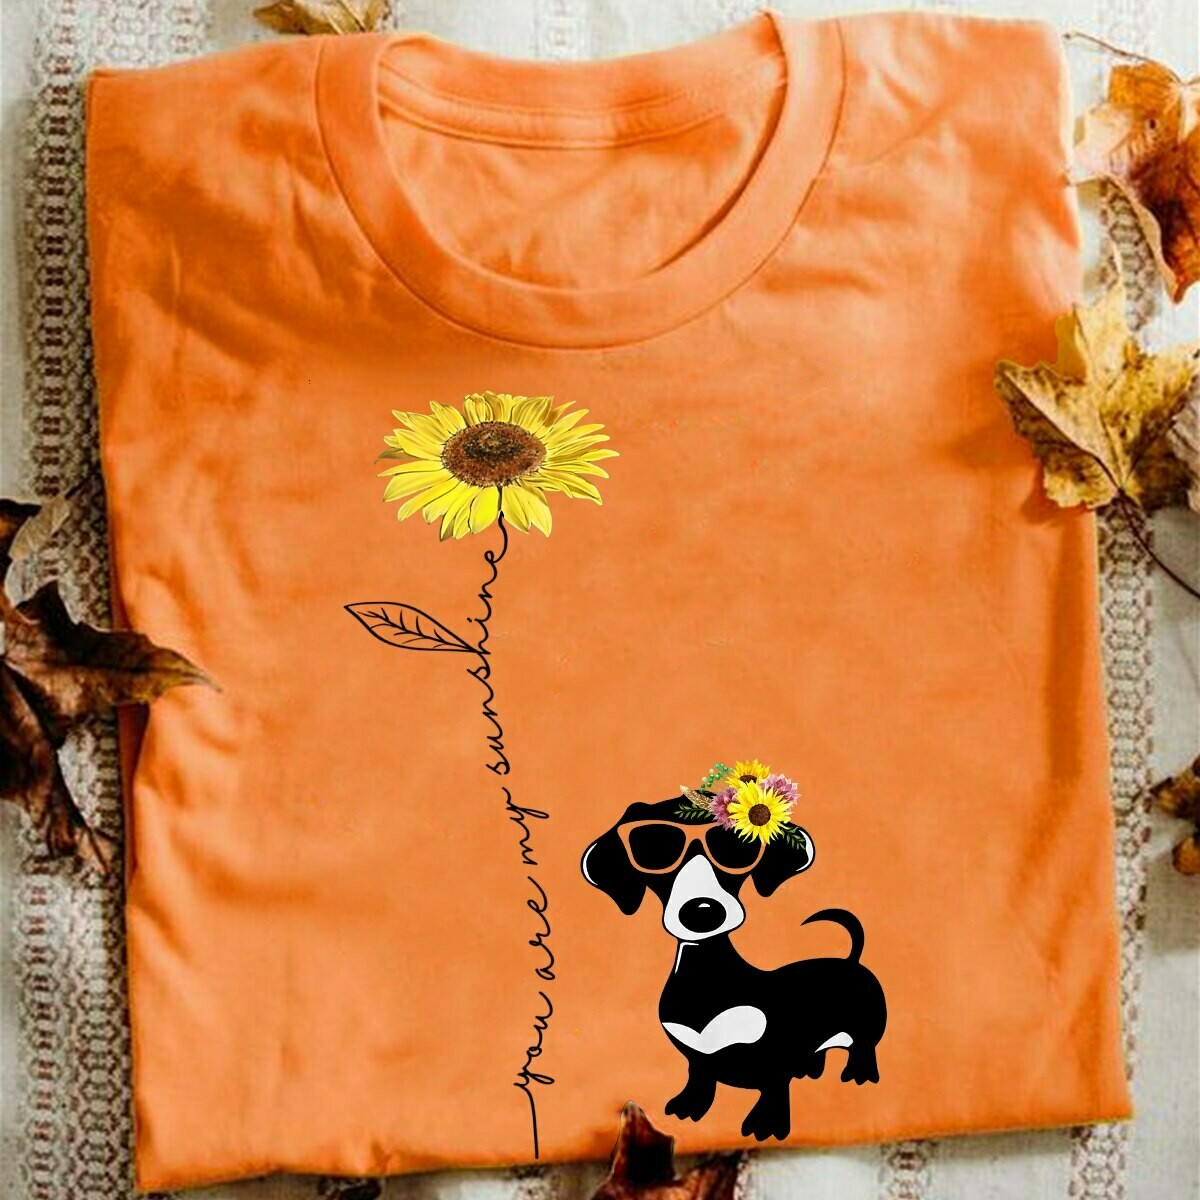 You Are My Sunshine, Dachshund Fans, Dachshund Fans Dog, Cute Dachshund Fans, dog, Dachshund Fans birthday, sunflower, sunflower